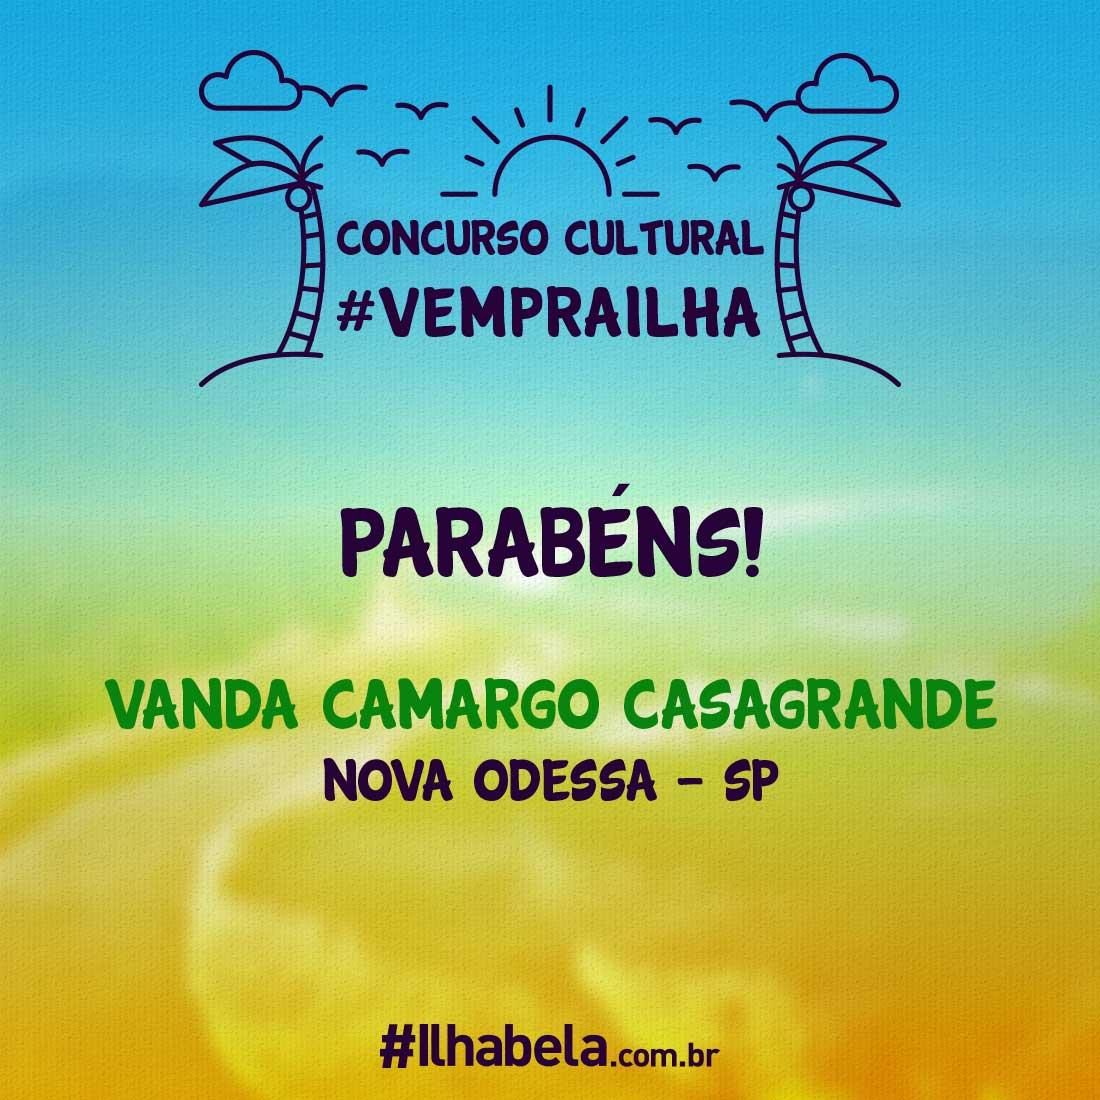 vencedor concurso cultural #vemprailha